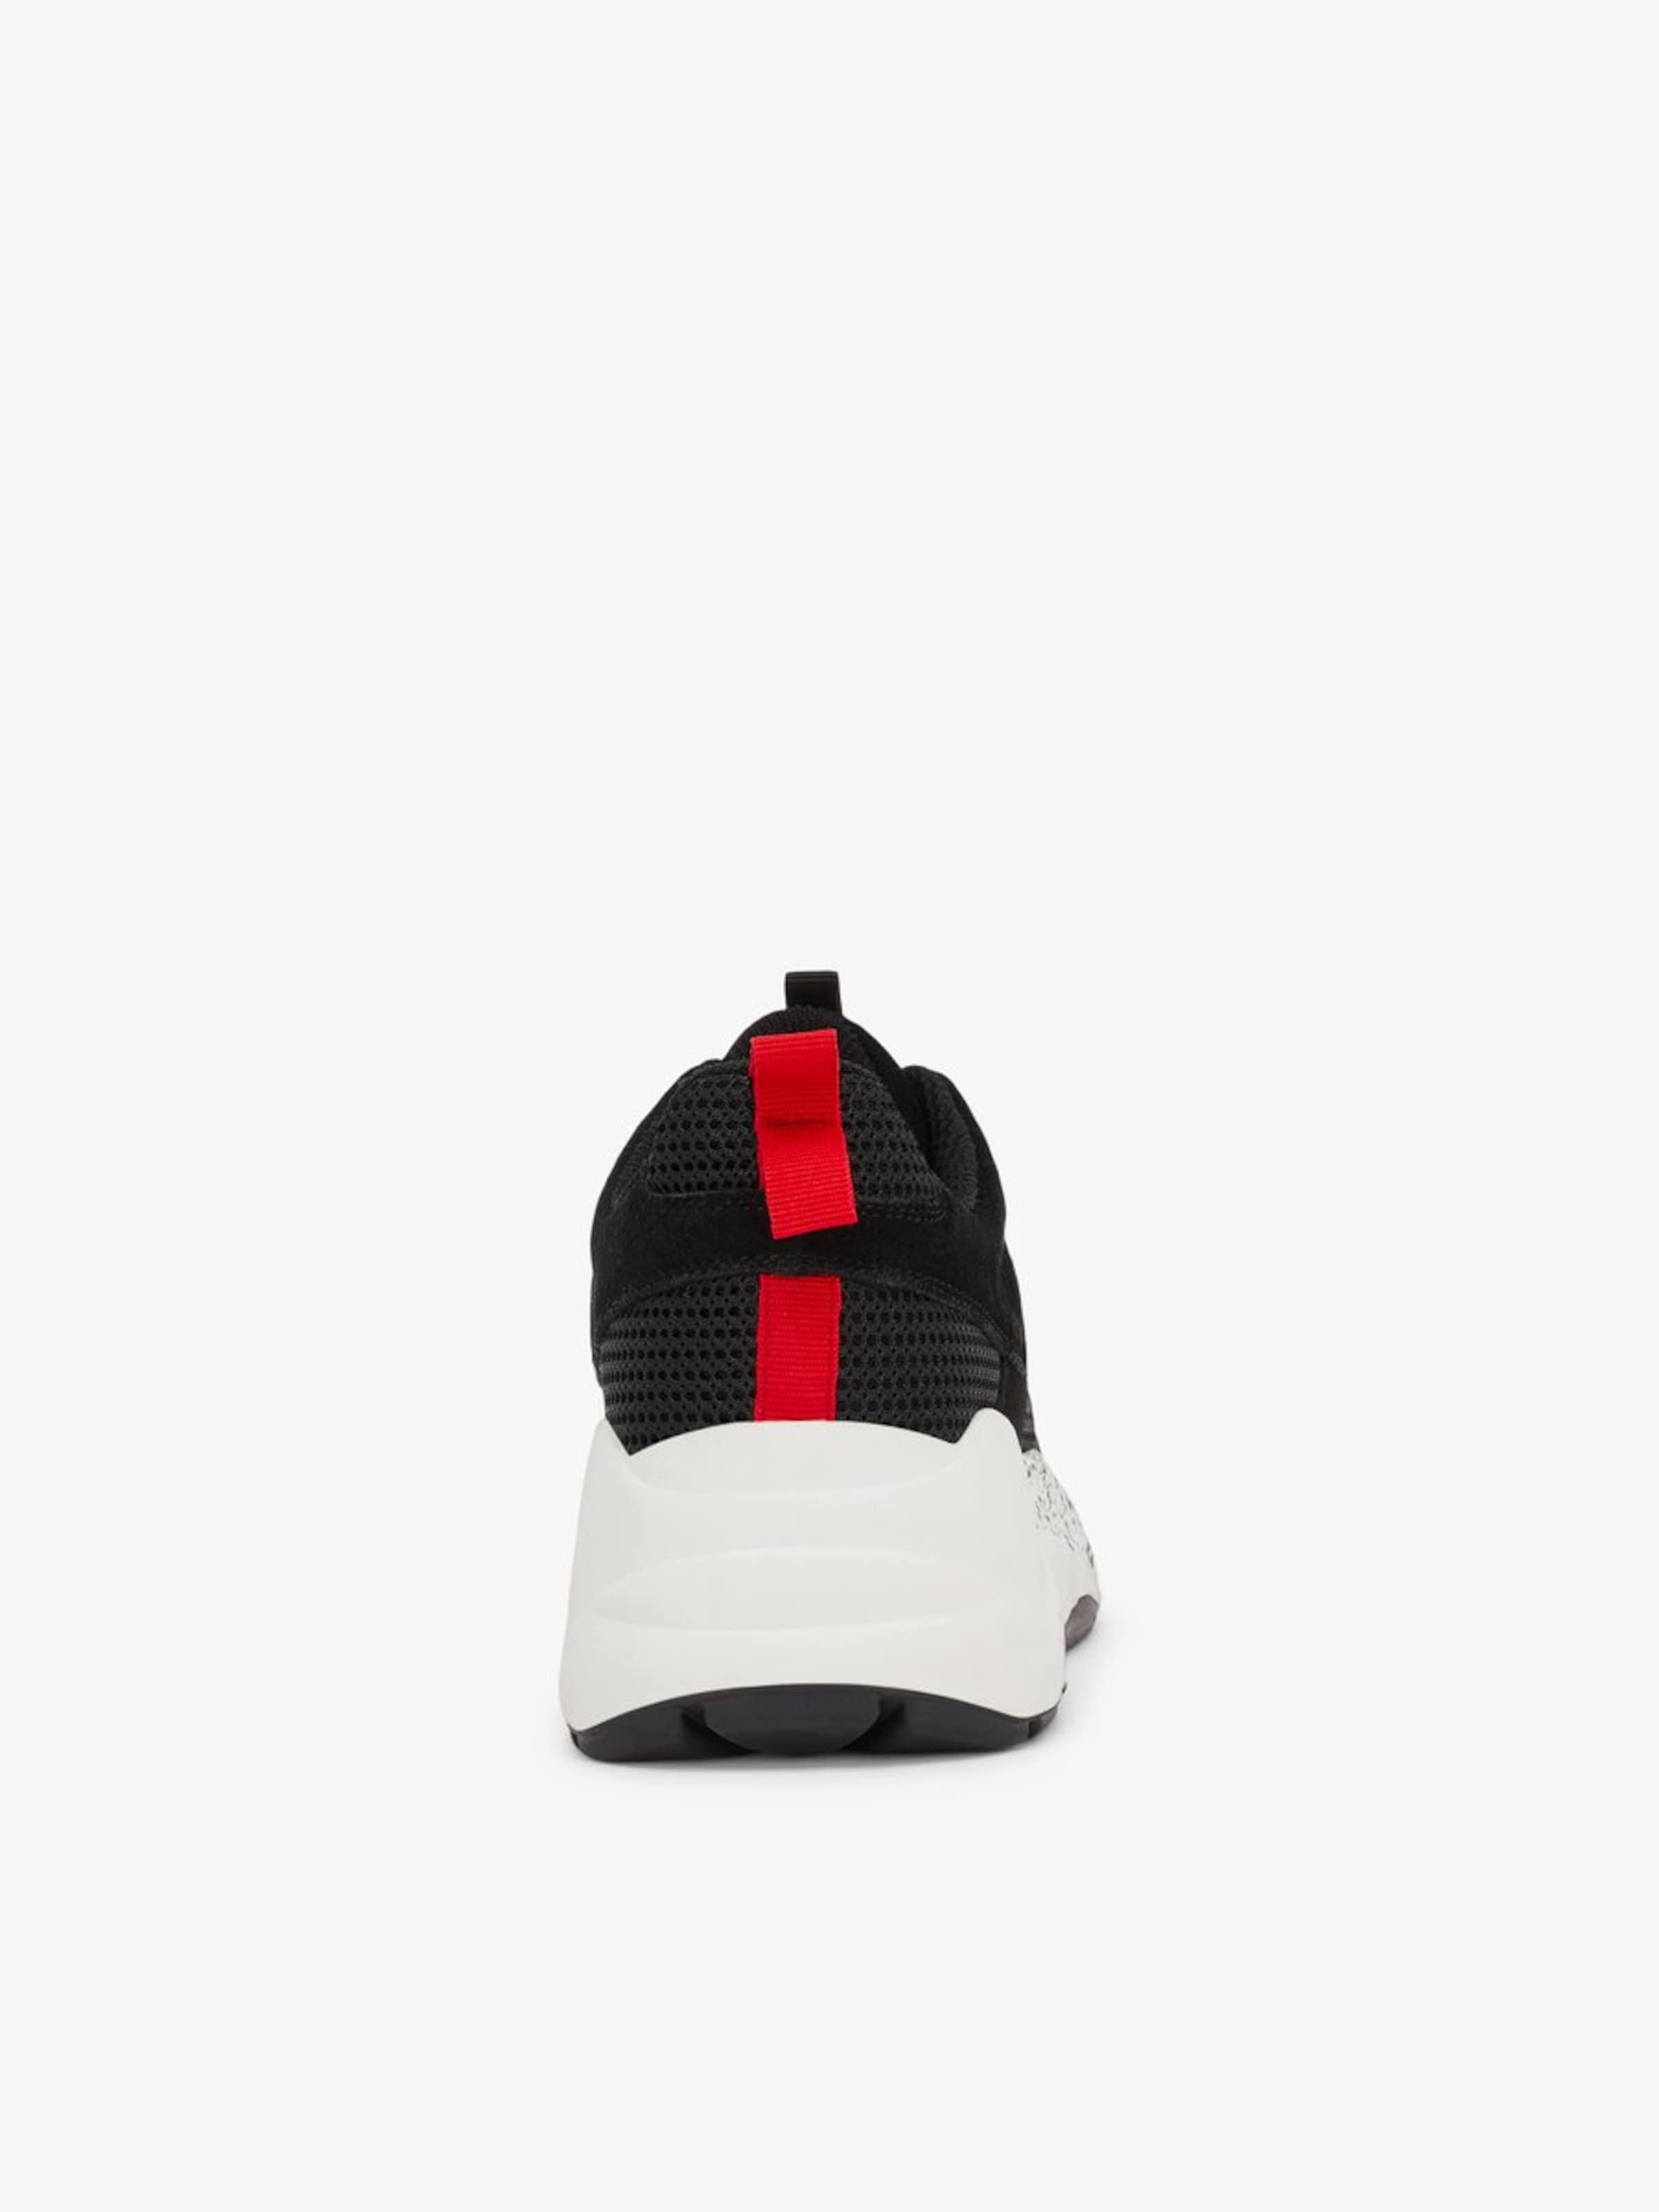 Bianco % Sportschuhe 'Becky' 50 % Bianco sonstiges Material, 50 % Textil Großer Rabatt 2c82e1